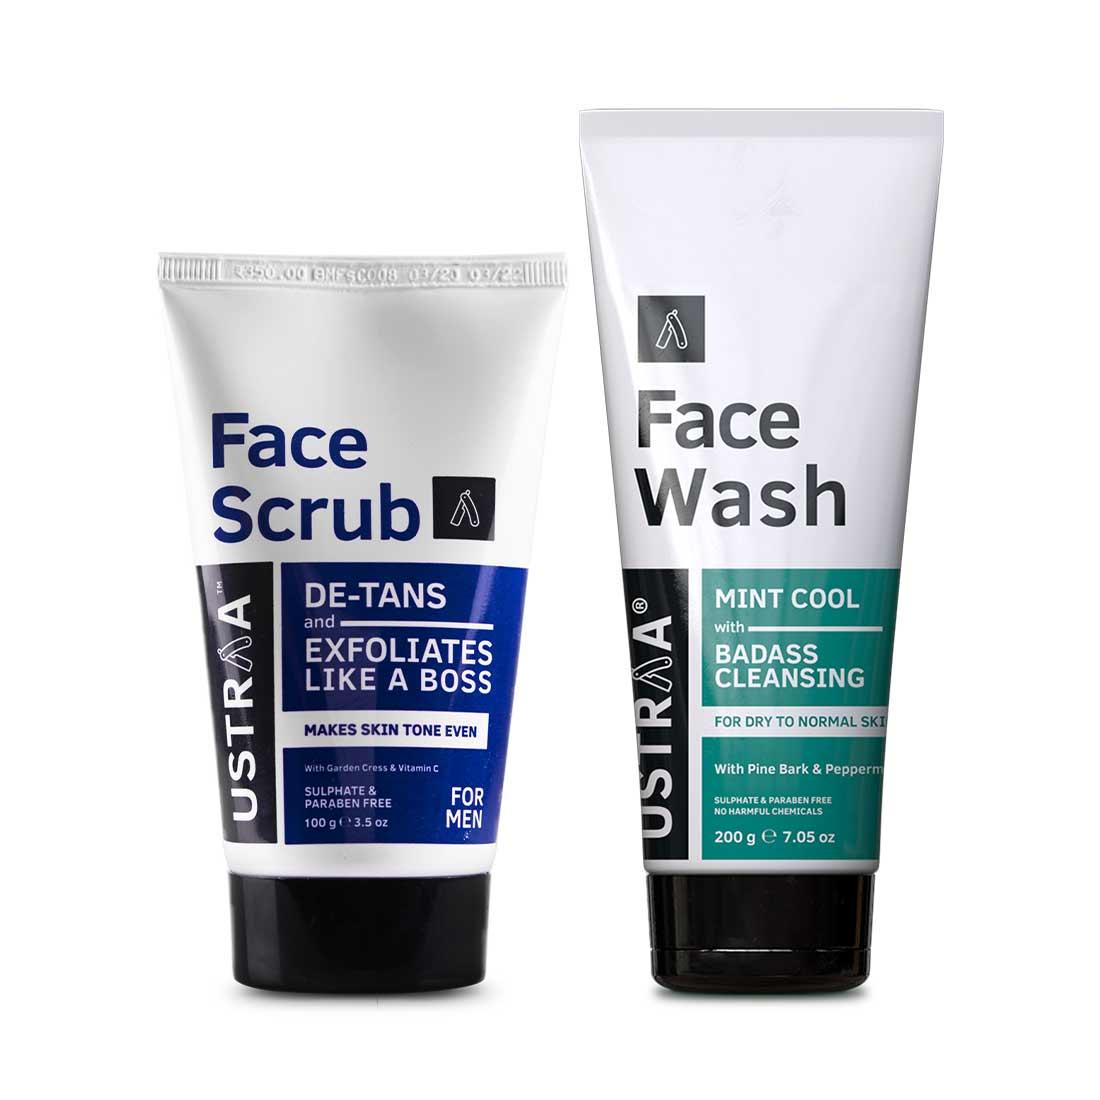 Ustraa | Ustraa Face Wash Dry Skin 200 g & Face Scrub De-Tan 100 g